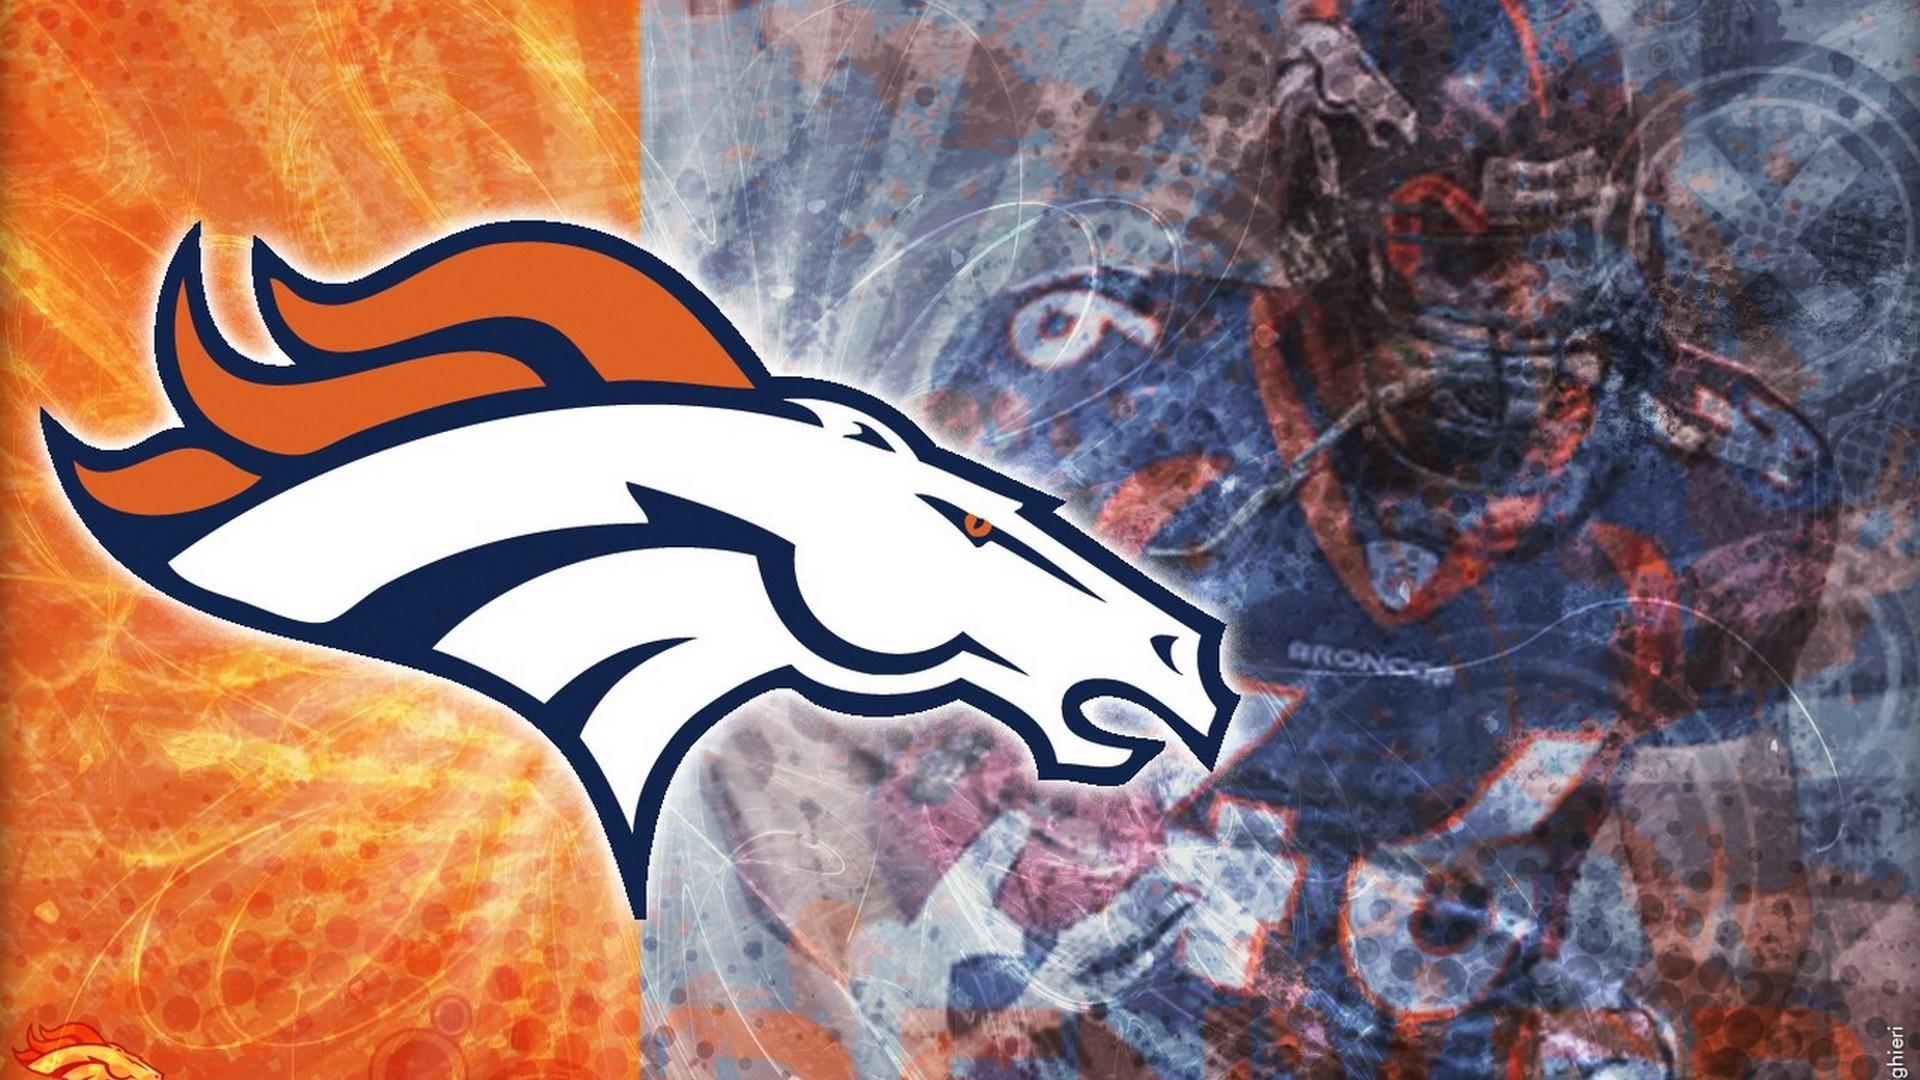 Res: 1920x1080, Denver Broncos Wallpaper For Mac Backgrounds